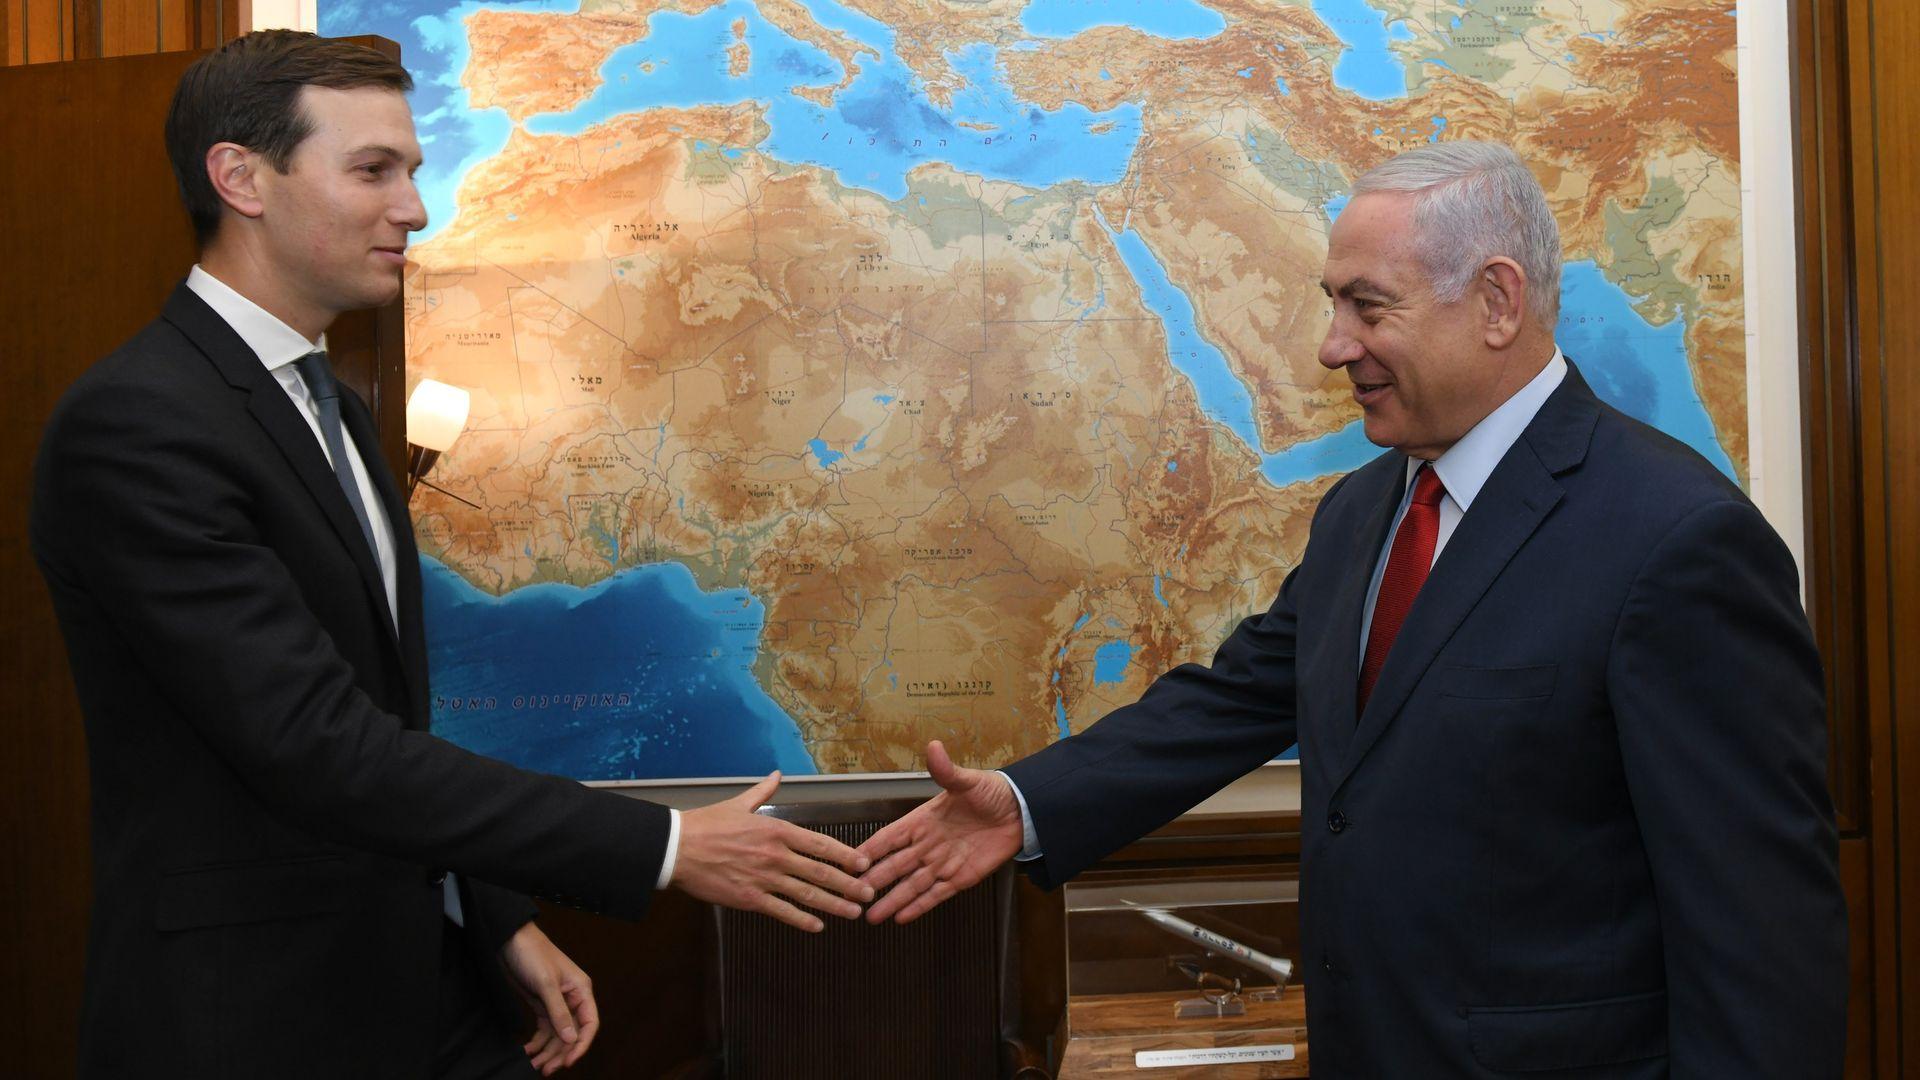 Scoop: Kushner expected to meet Netanyahu and Gantz on Israel trip